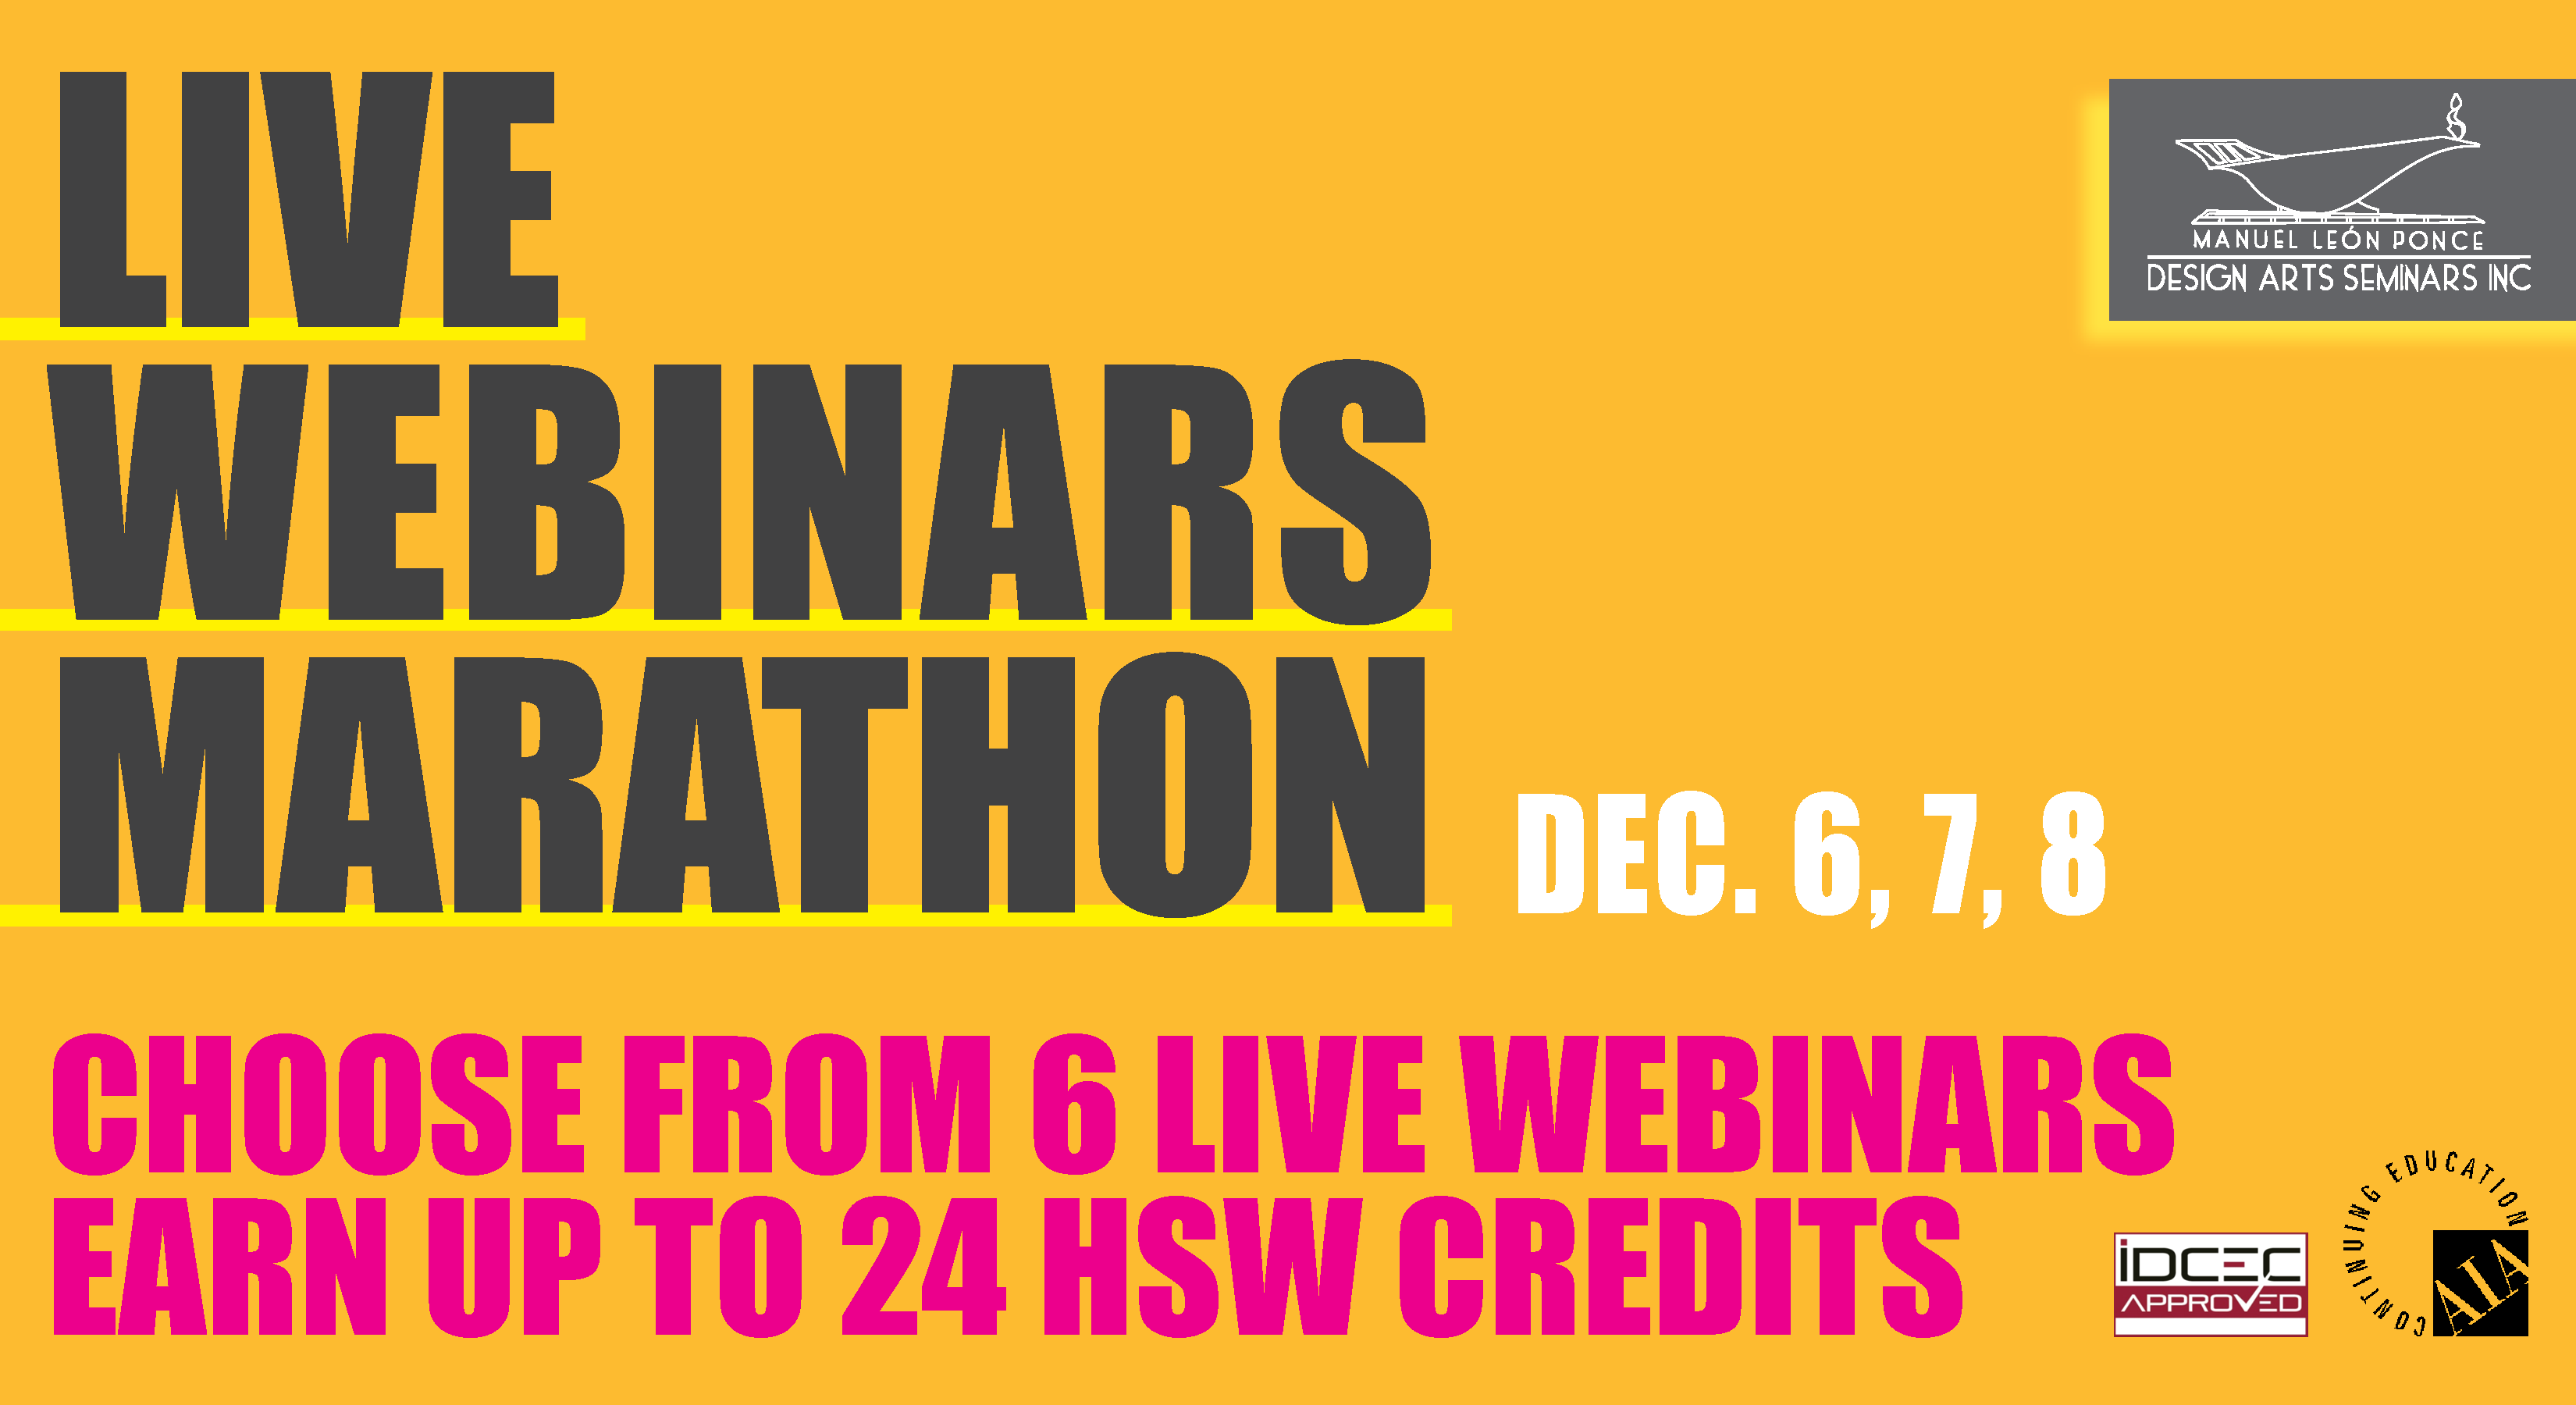 Live Webinars Marathon